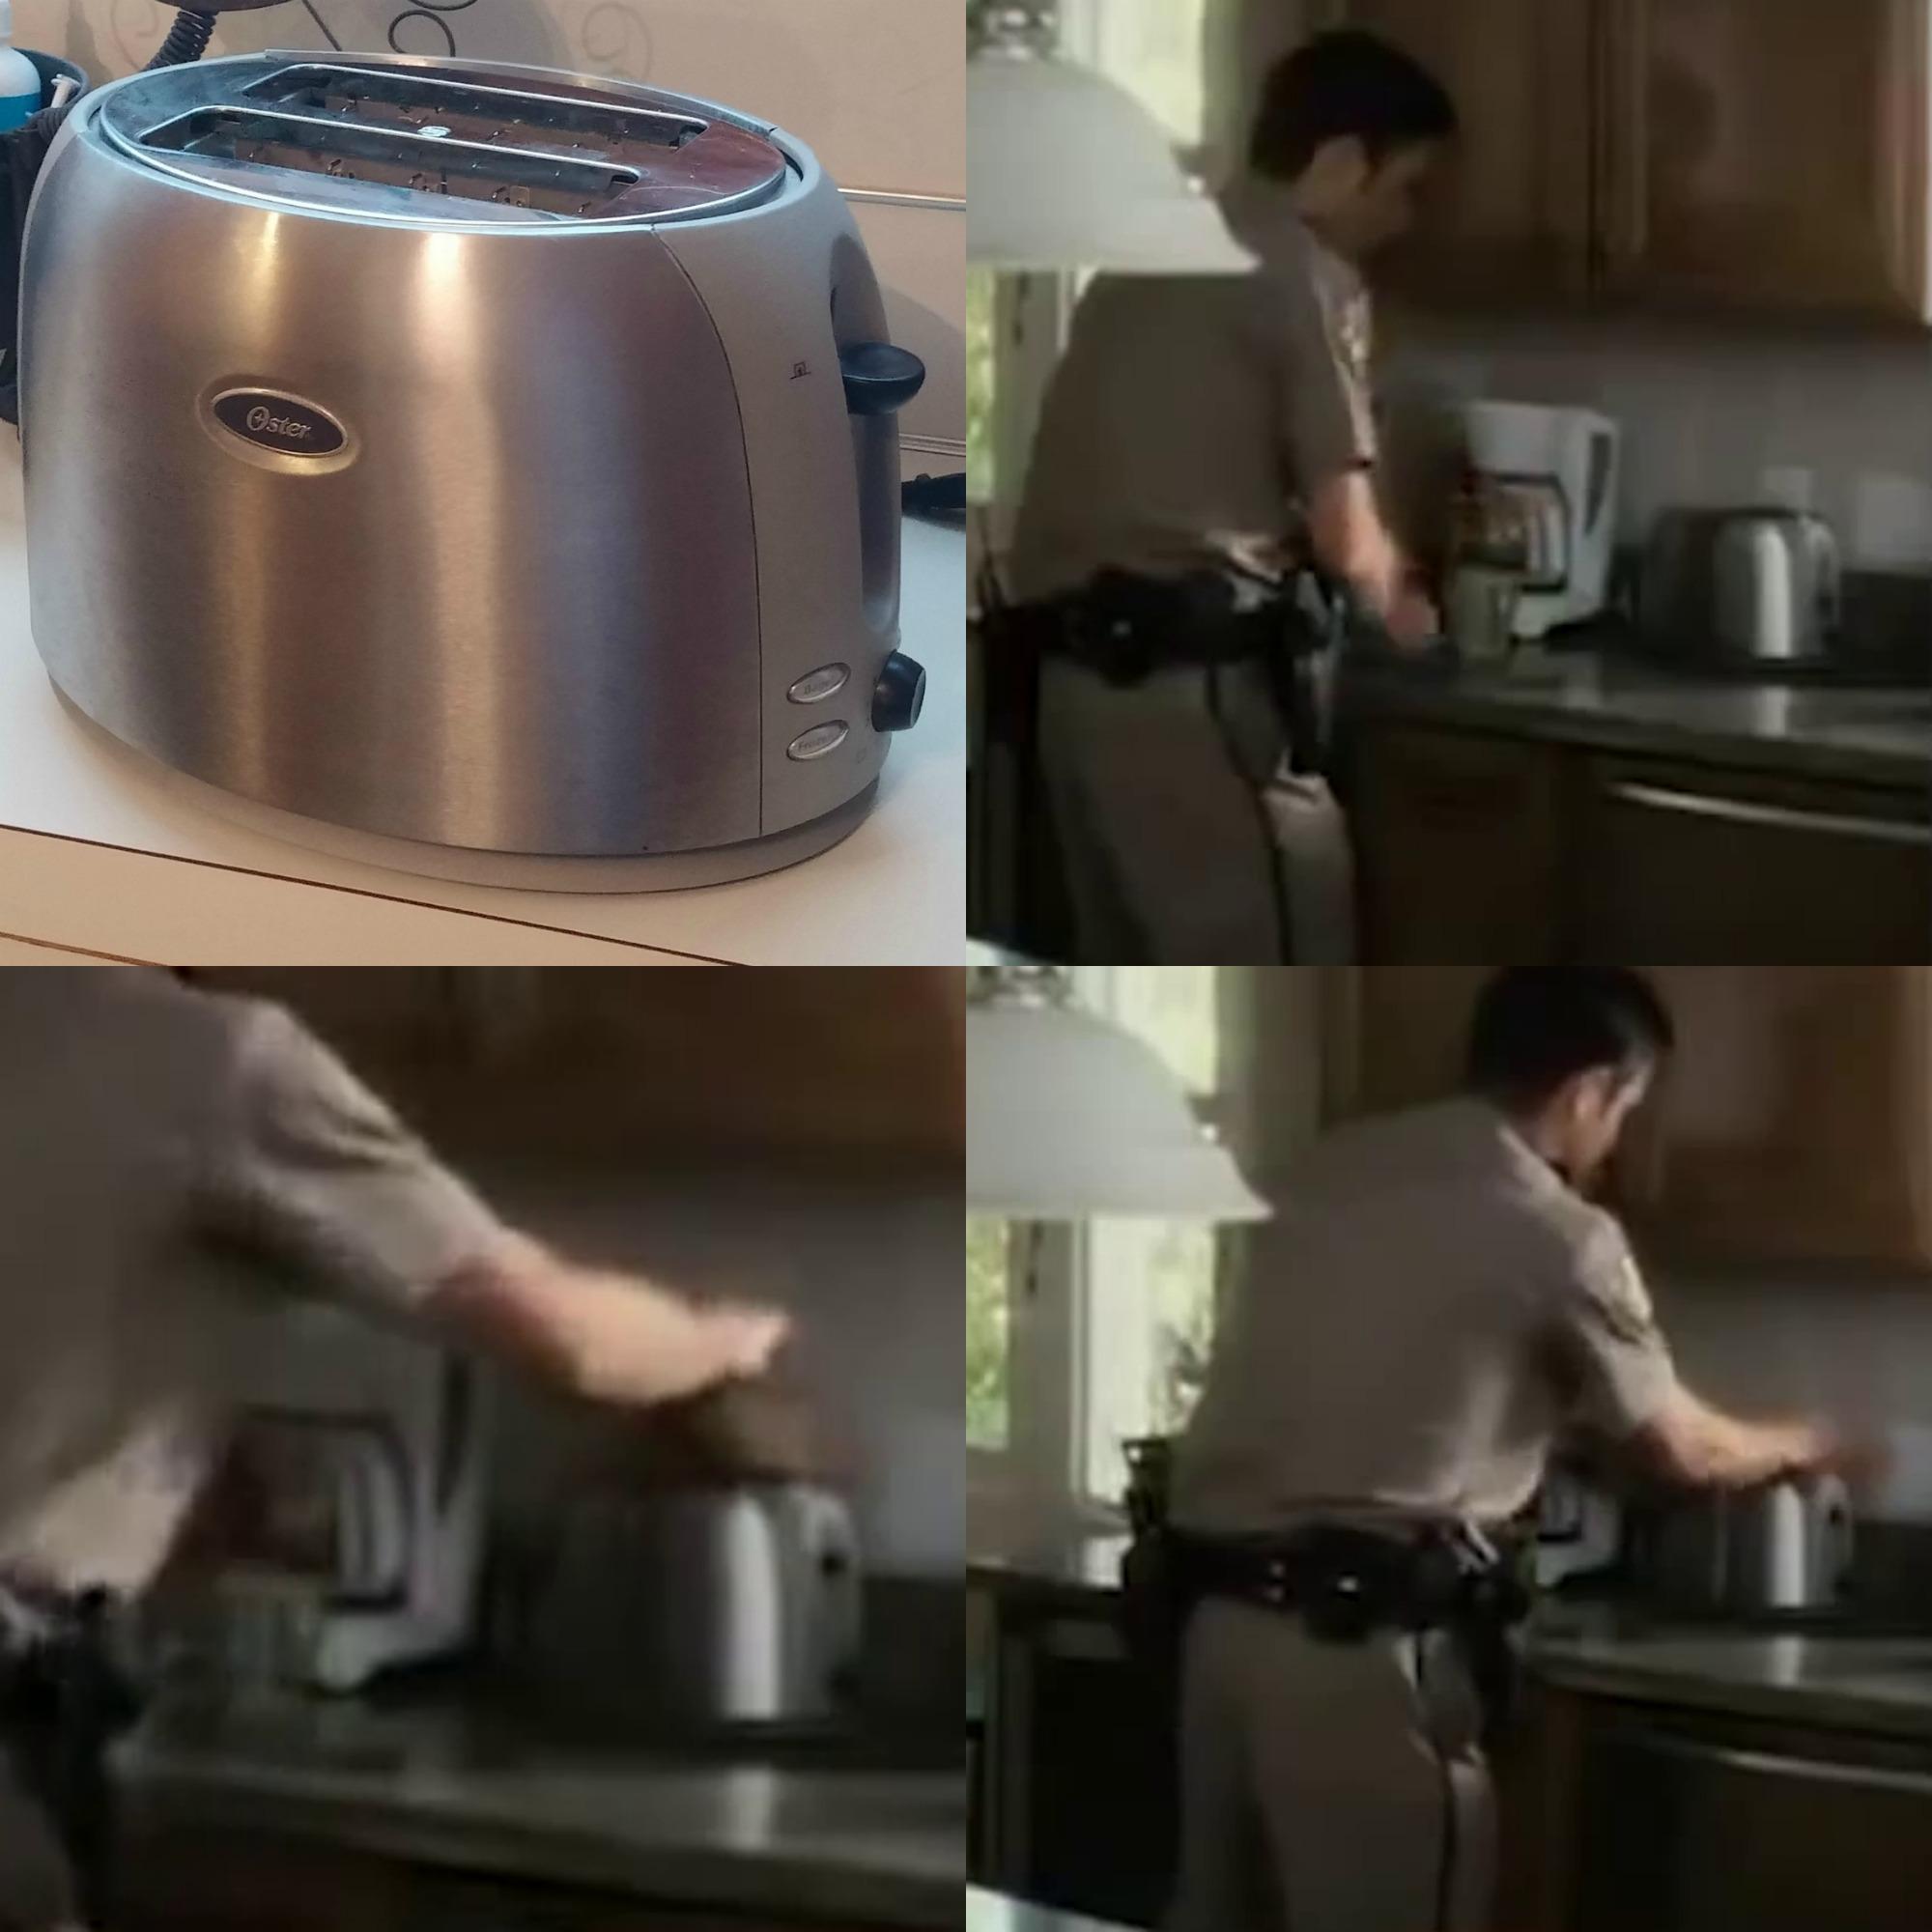 Scream 4 toaster.jpg